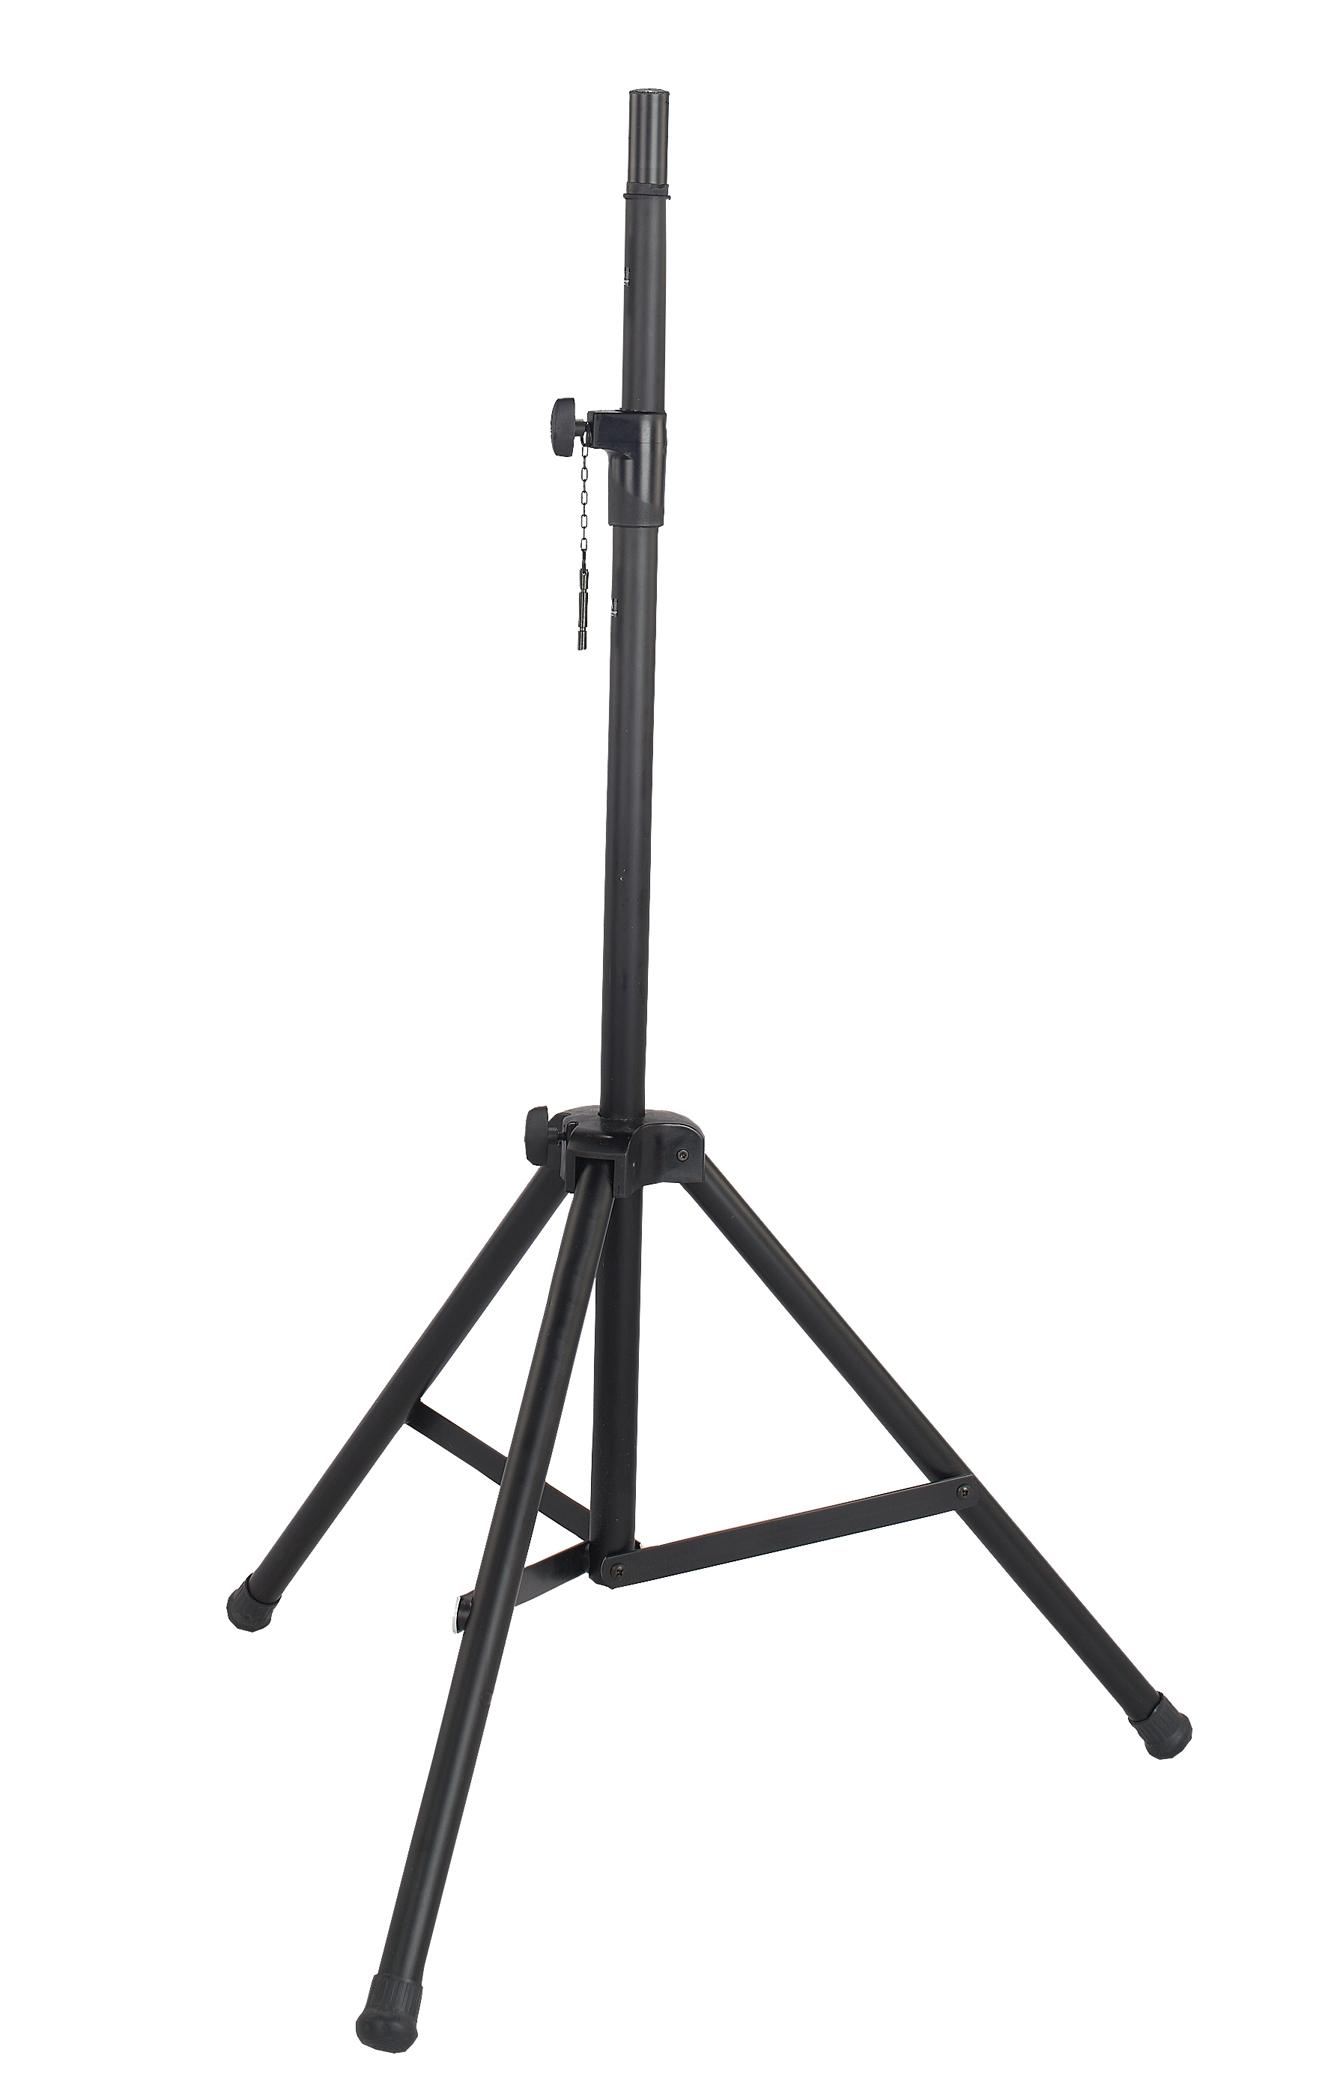 Amplivox S1080 Heavy Duty Tripod Speaker Stand